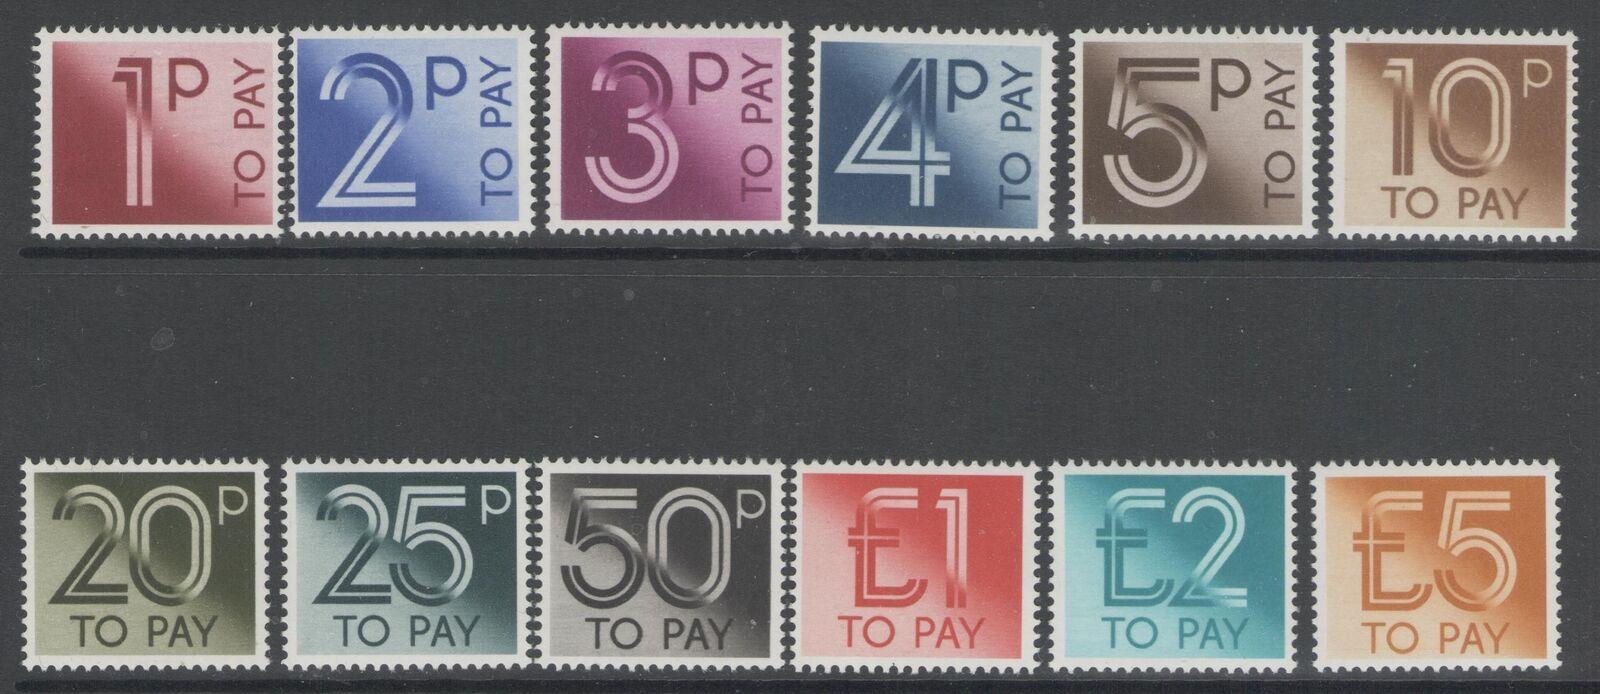 GB SGD90/101 1982 POSTAGE DUE SET MNH